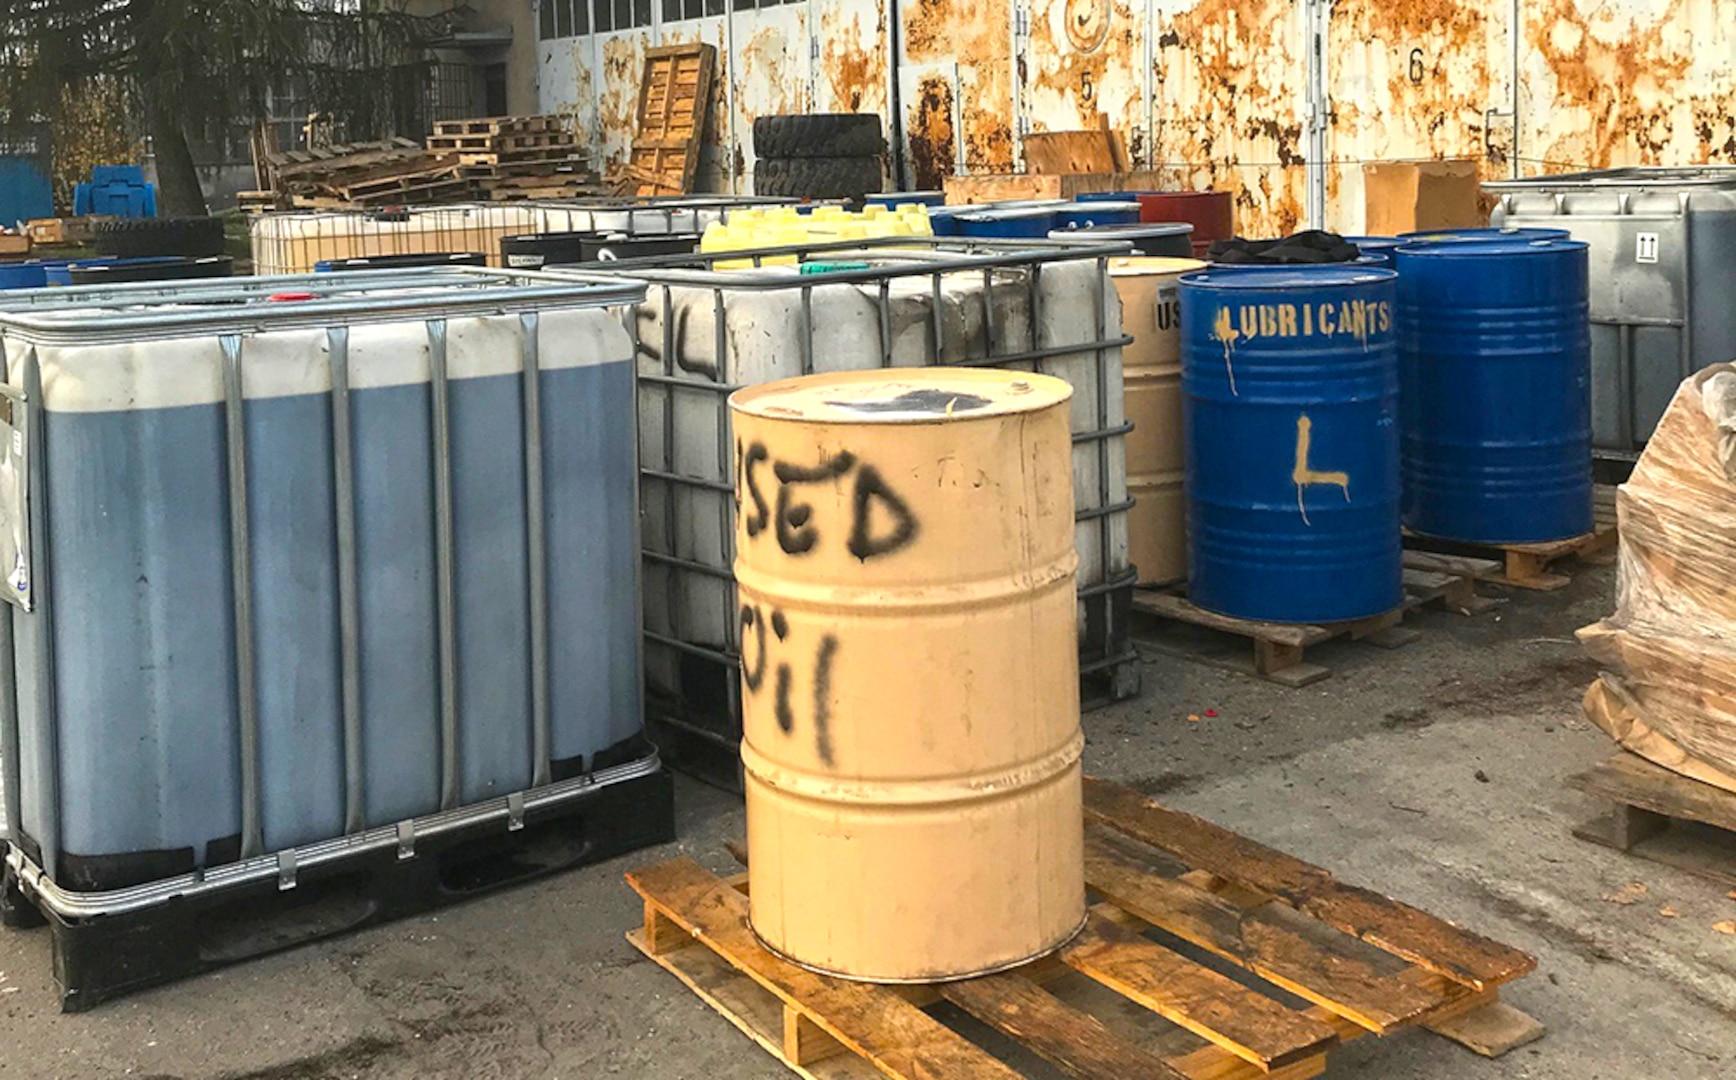 Barrels of fluids sit in a parking lot.